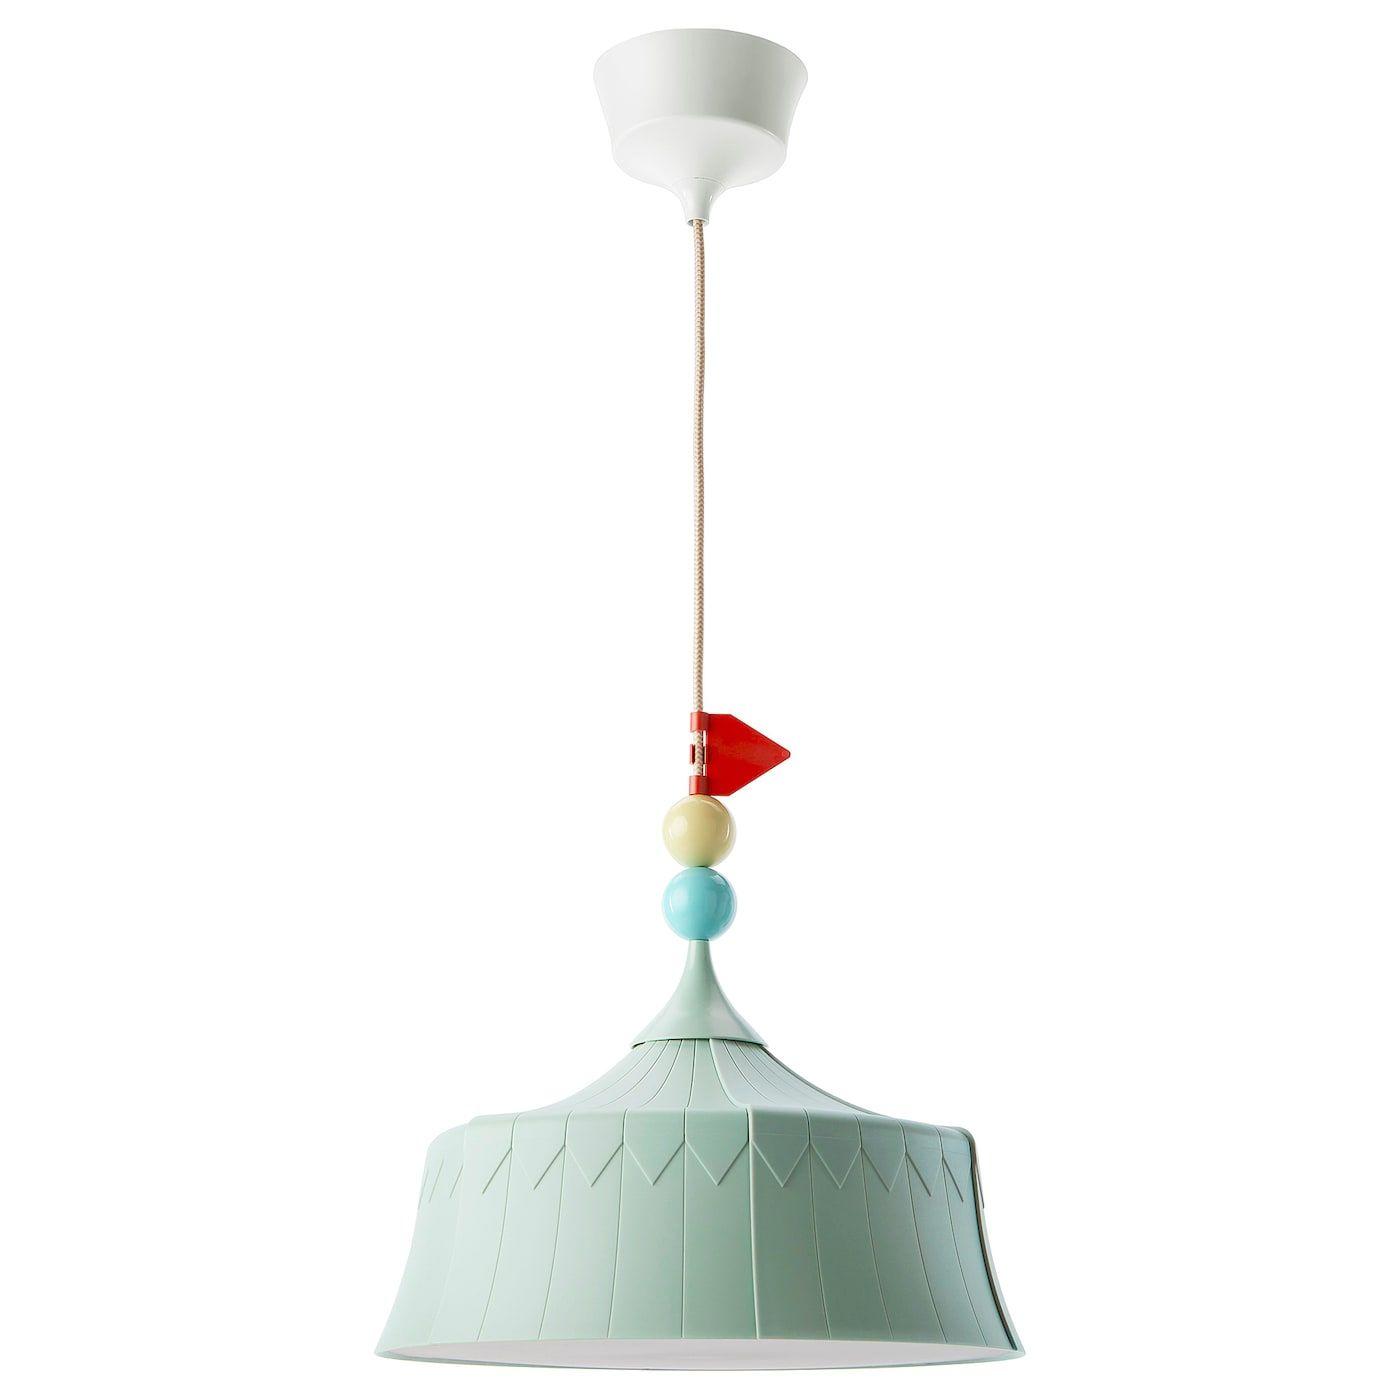 Trollbo Pendant Lamp Light Green Pendant Lamp Lamp Light Ikea